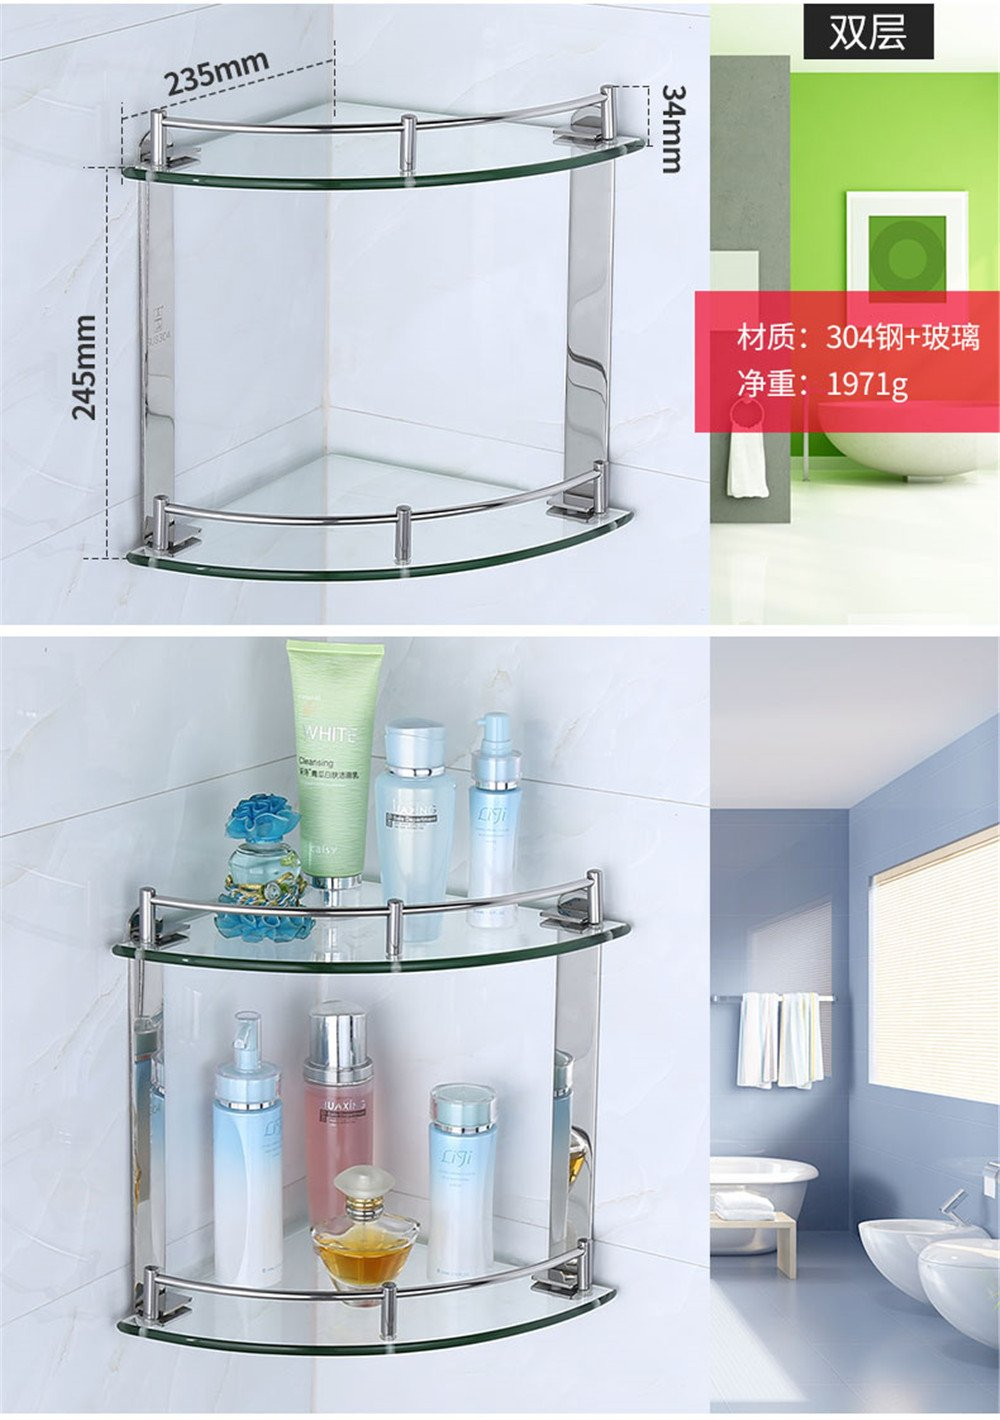 Glass tripod, bathroom shelf, 304 stainless steel corner frame ...